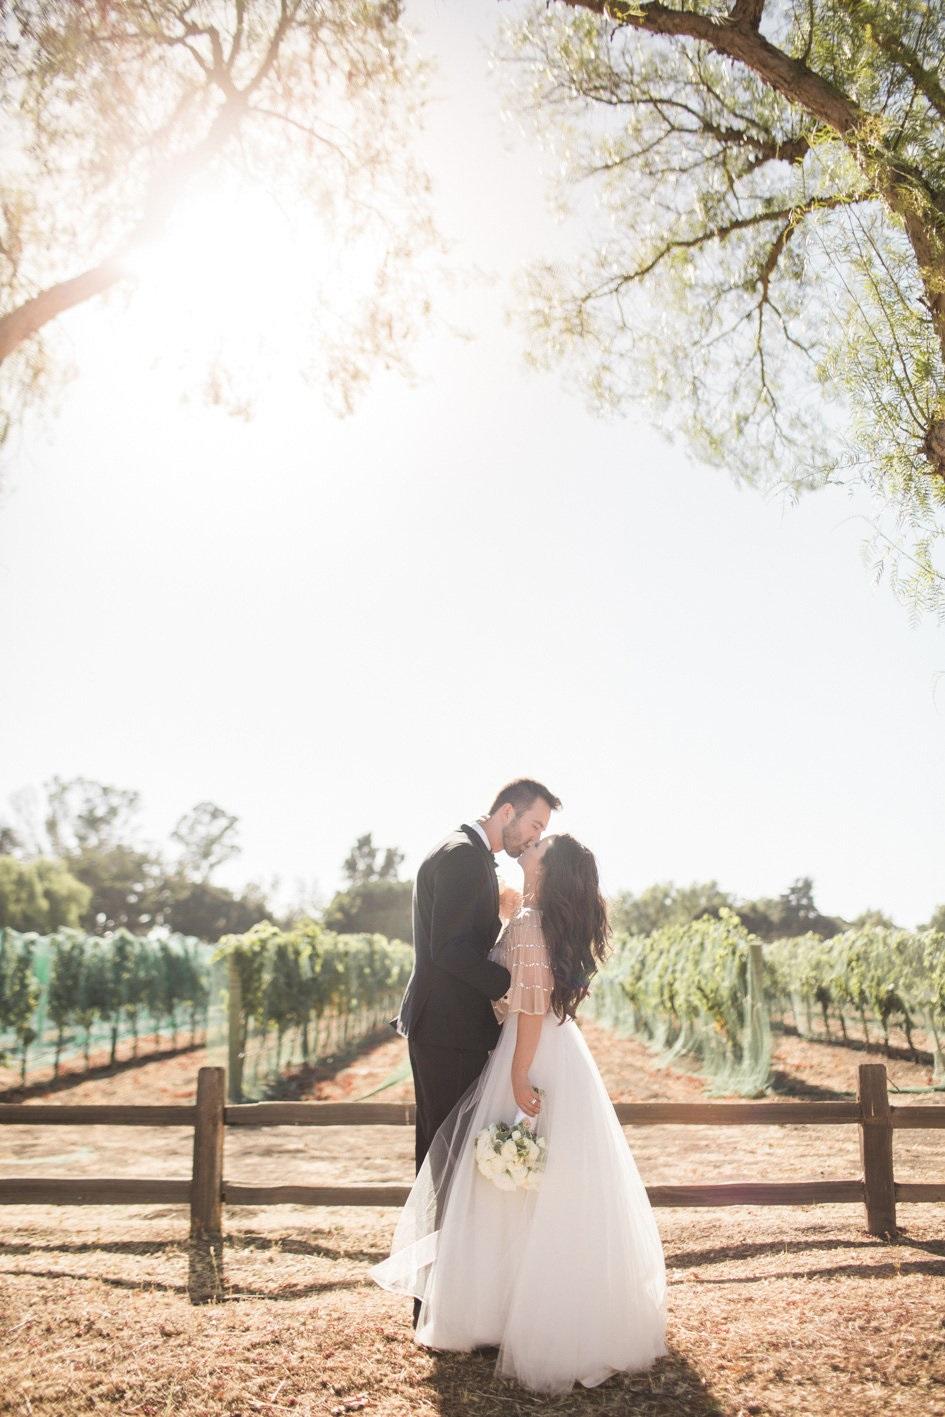 www.santabarbarawedding.com | Anna J Photography | Sogno del Fiore | Bride and Groom